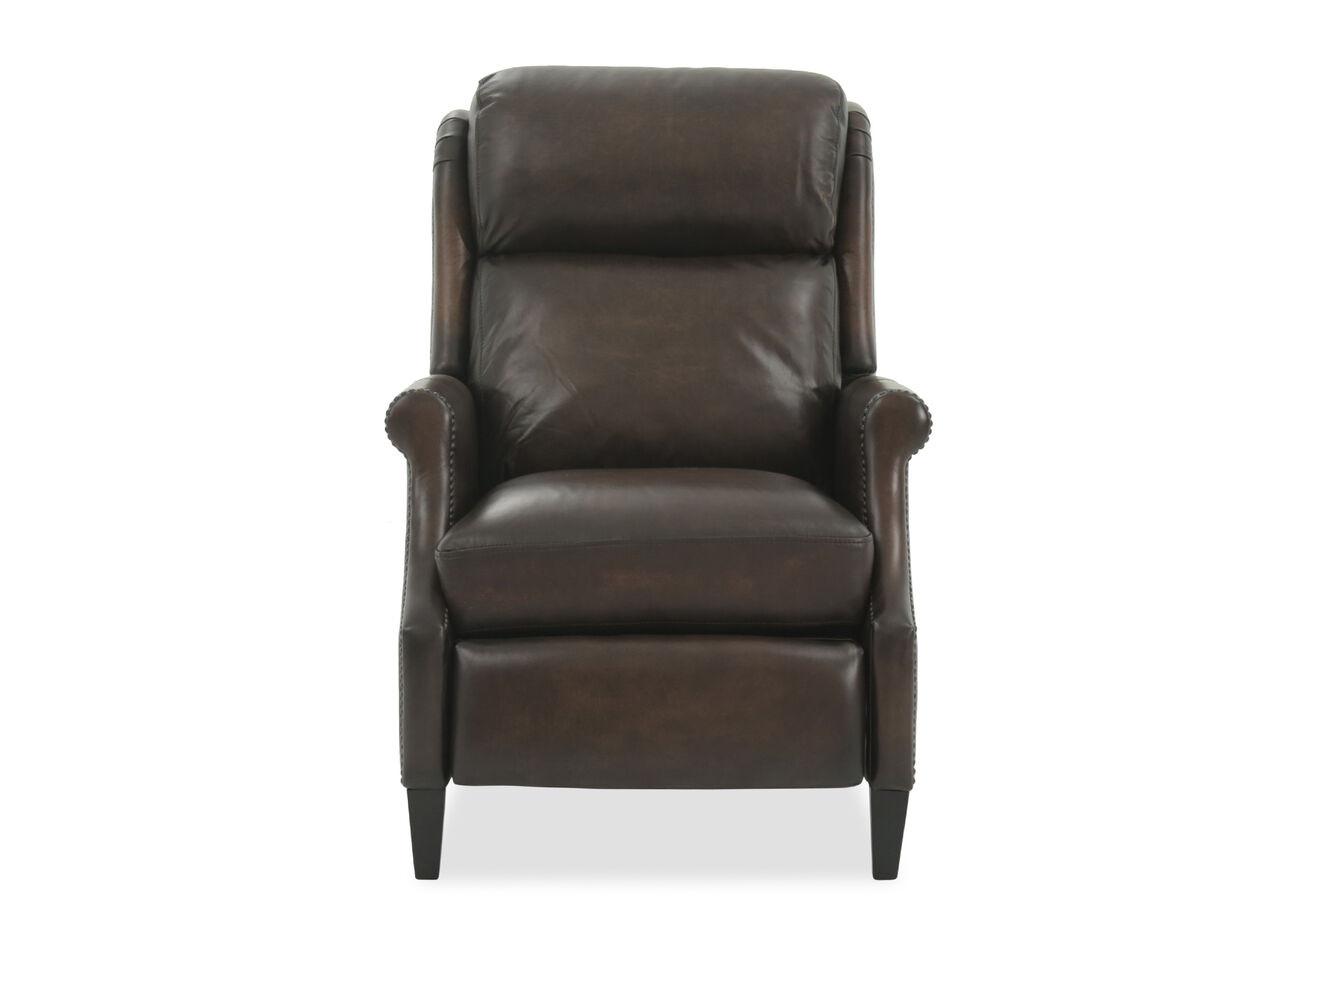 Discontinued Bernhardt Furniture House Design Ideas